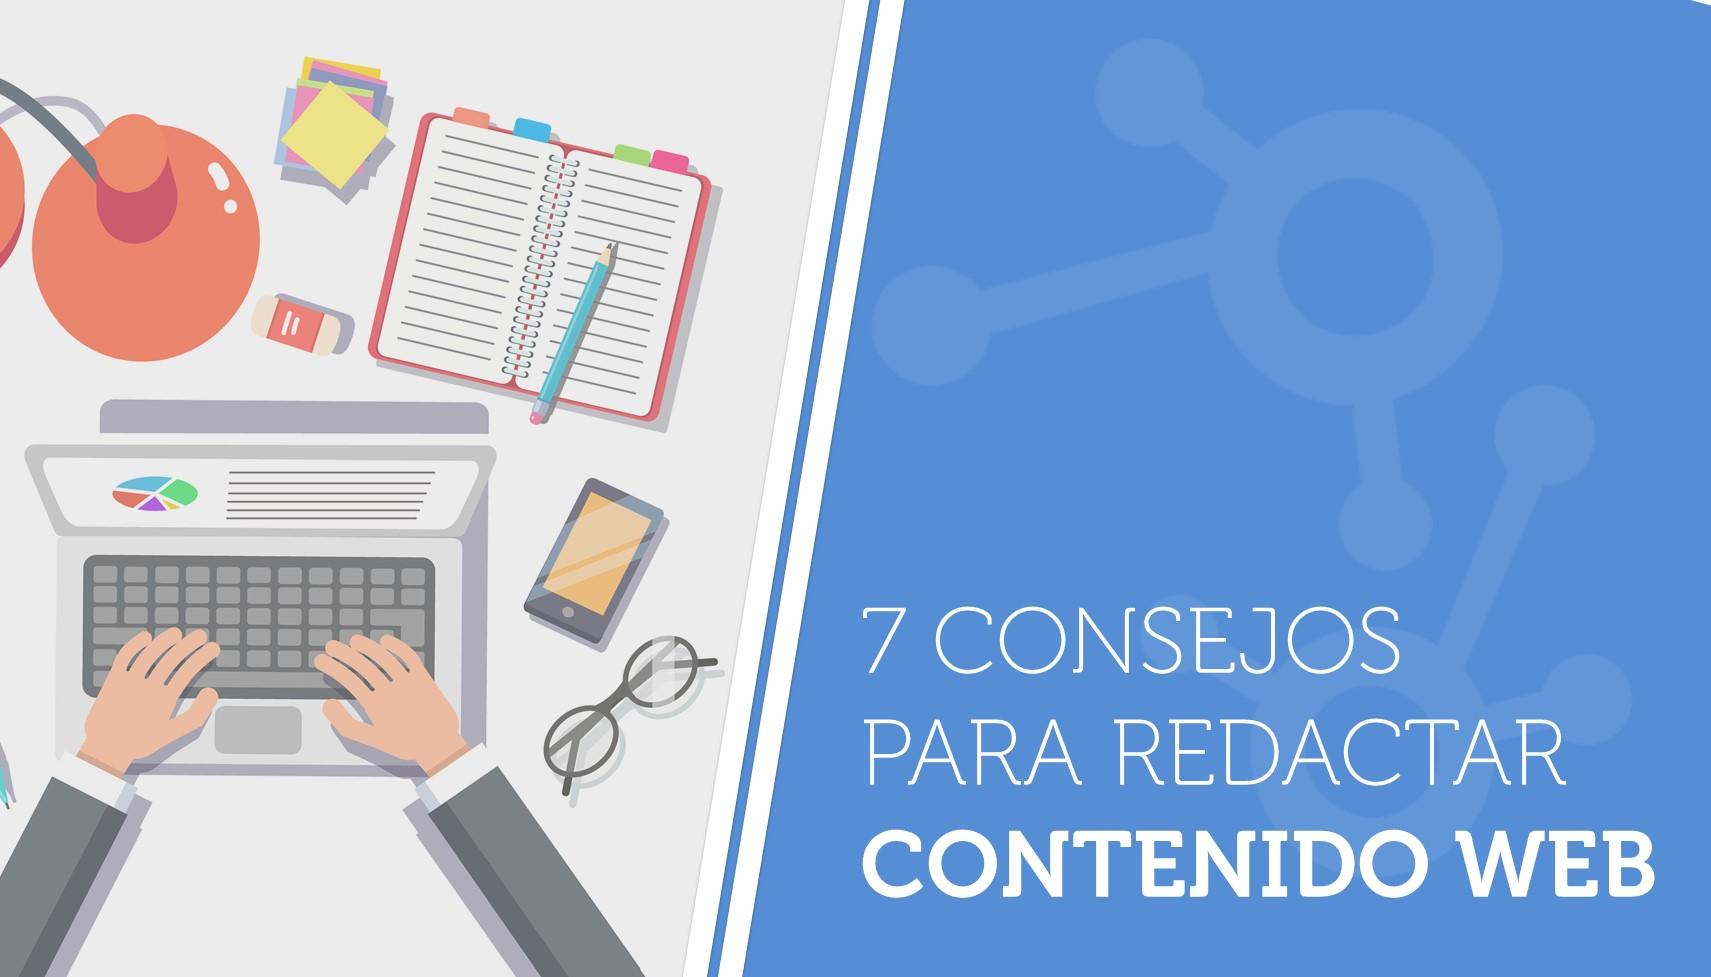 Siete consejos para redactar contenido web